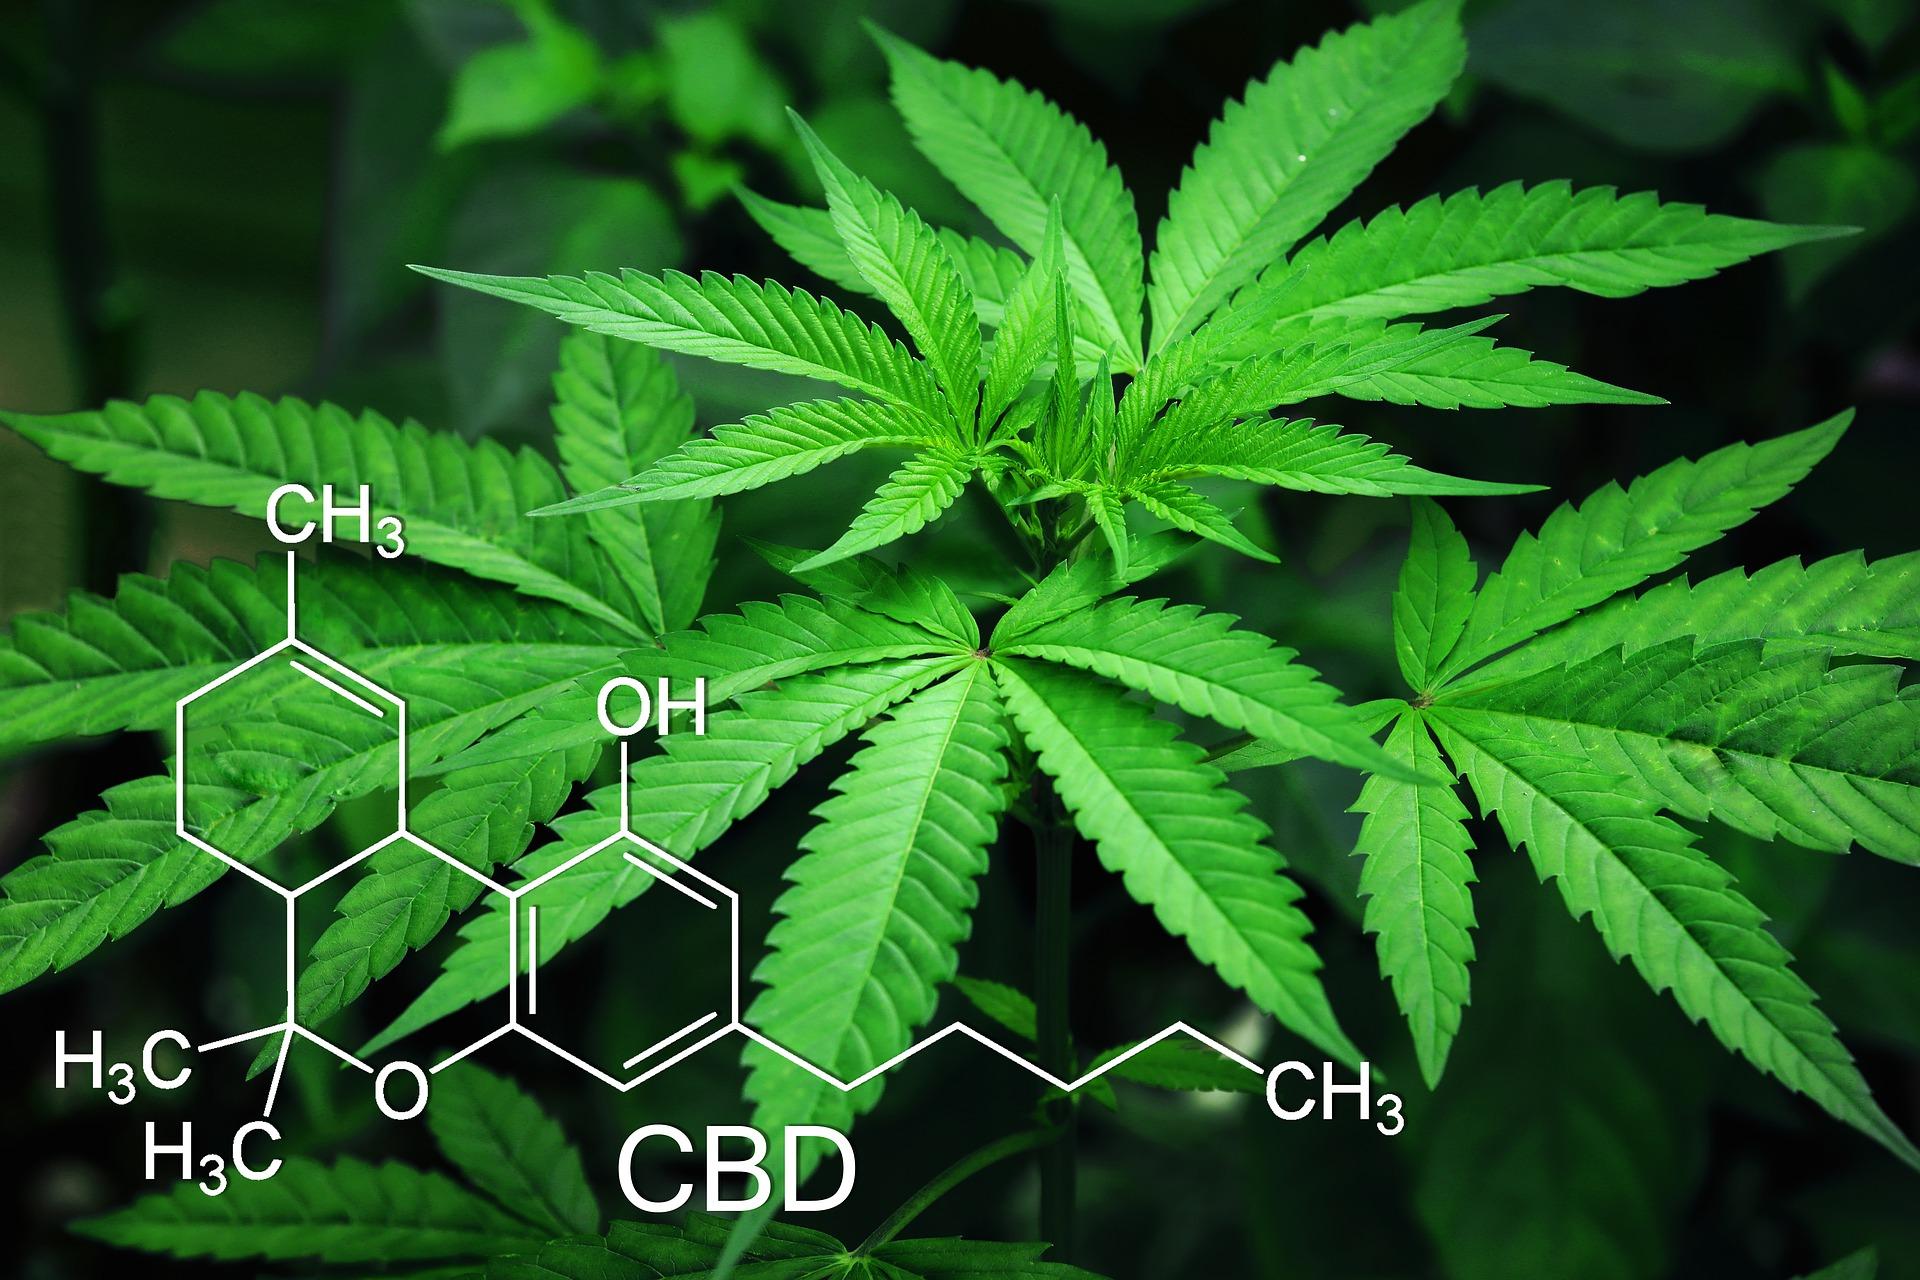 Wissenschaft: Cannabinoide helfen bei Entzündungen